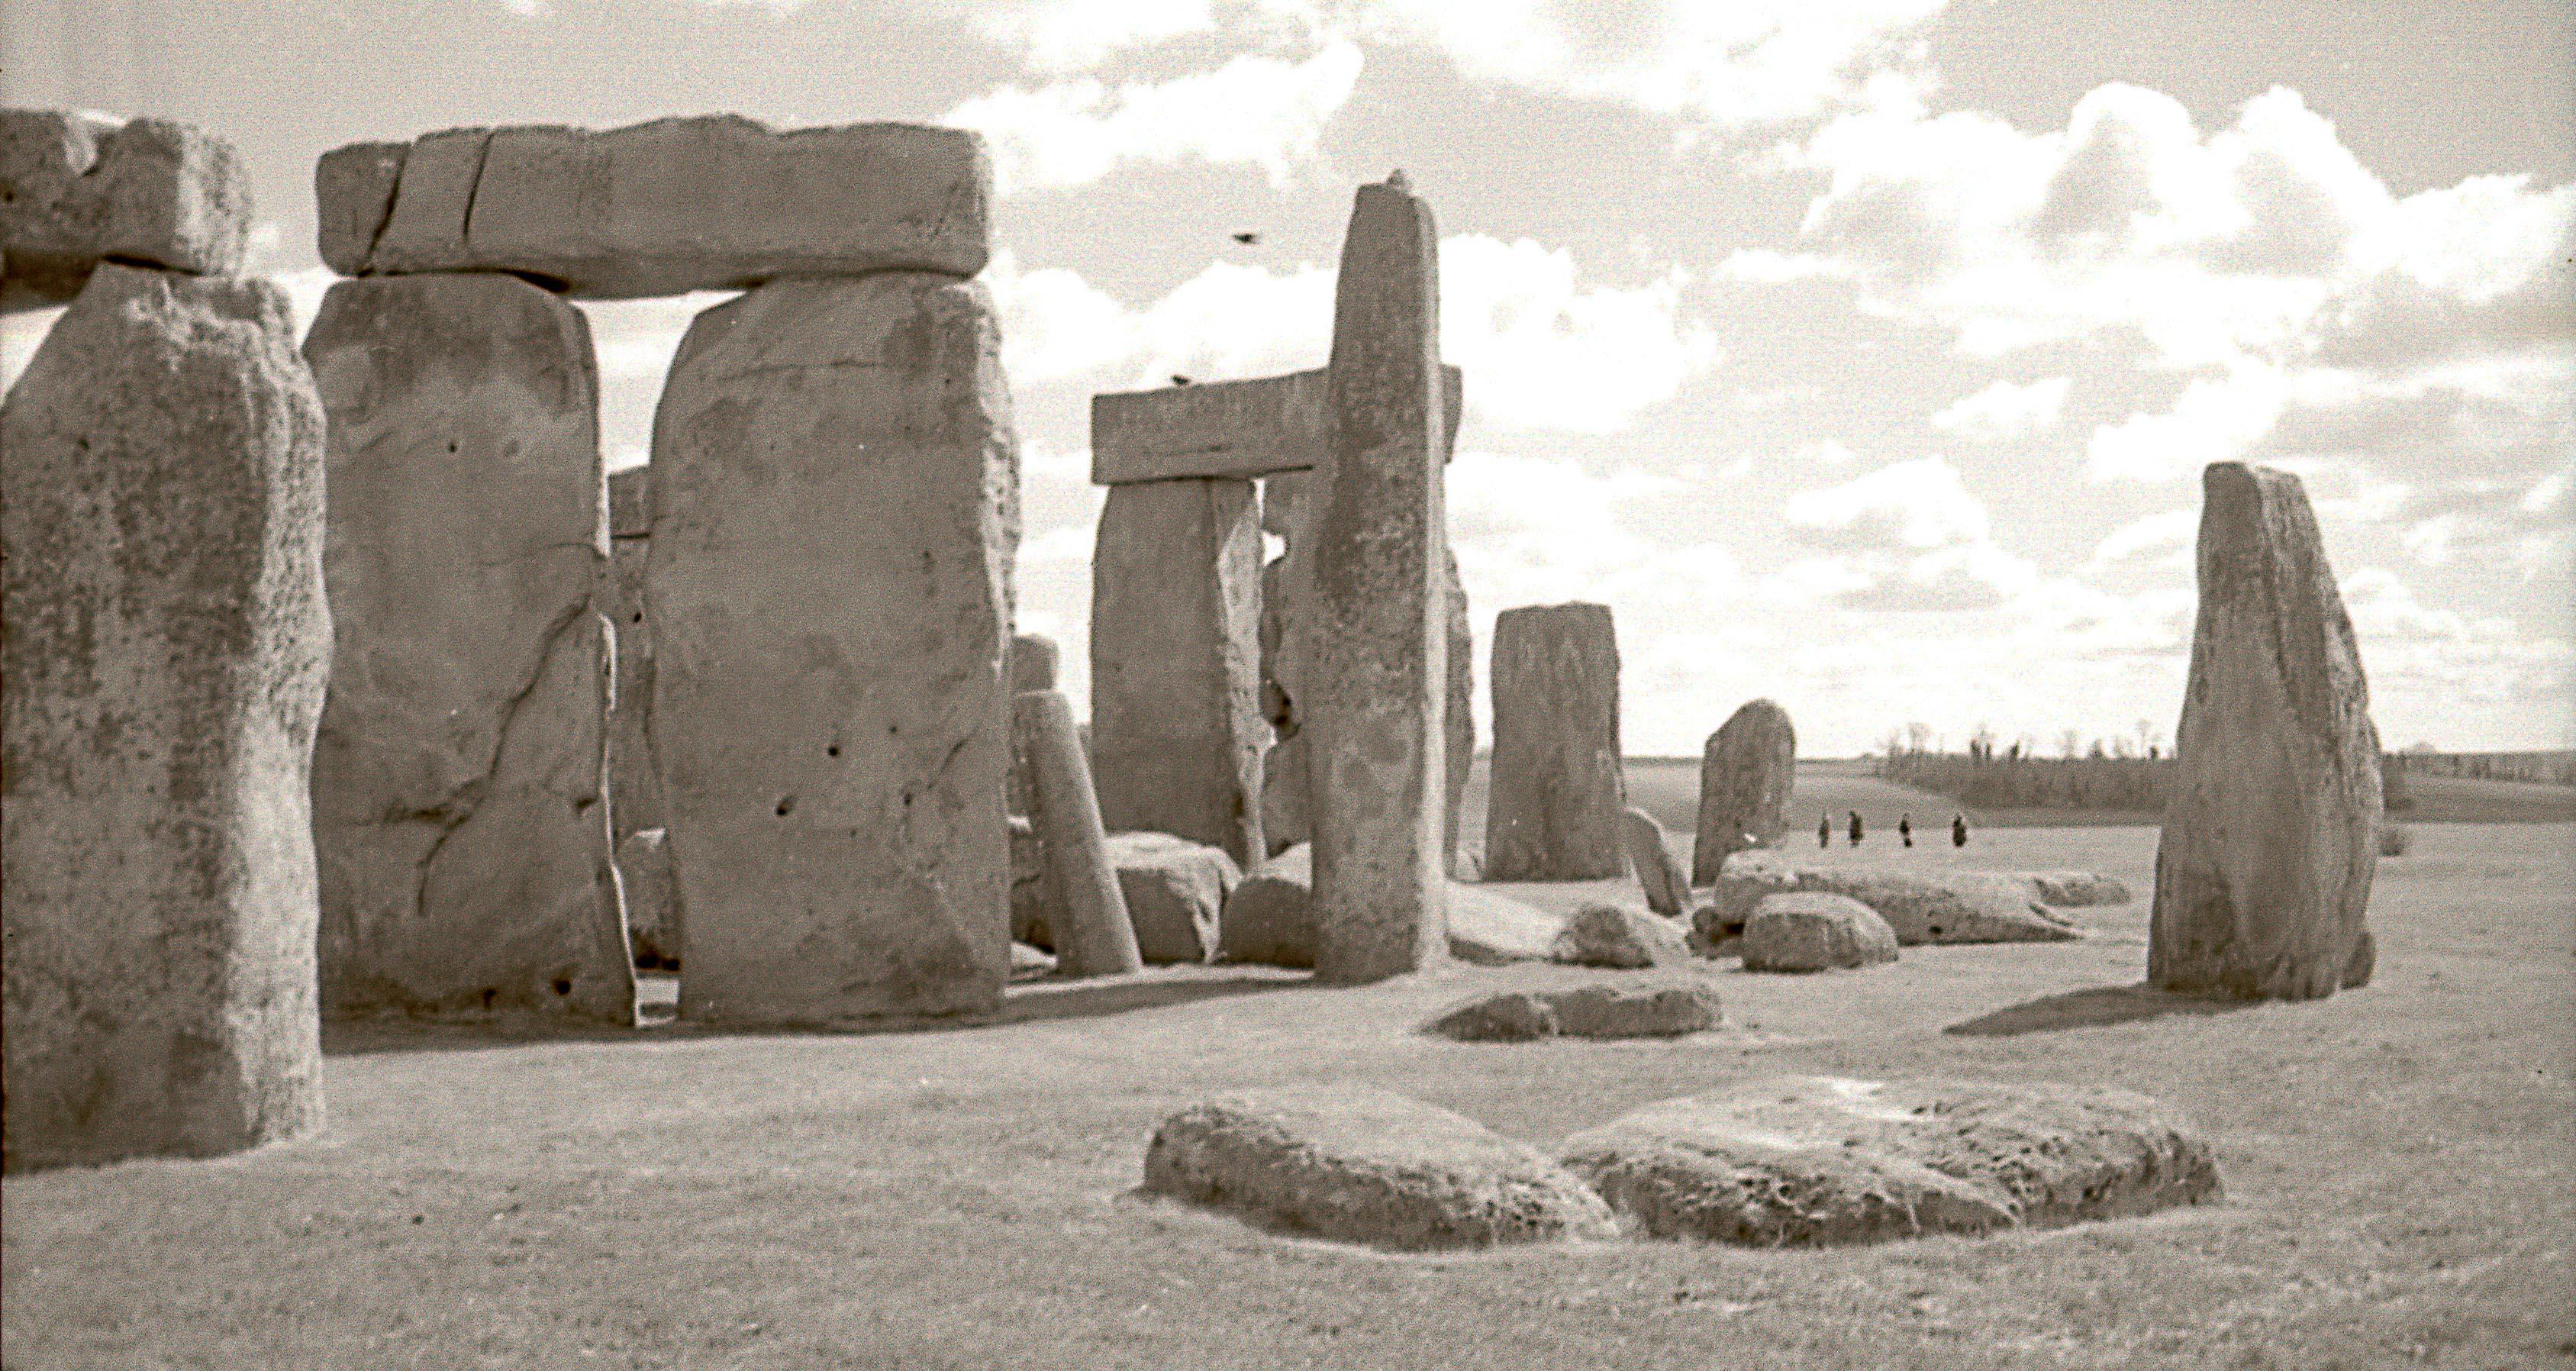 God and Evolution stonehenge 3 1543424 2 1  spirituality science news other news lifestyle